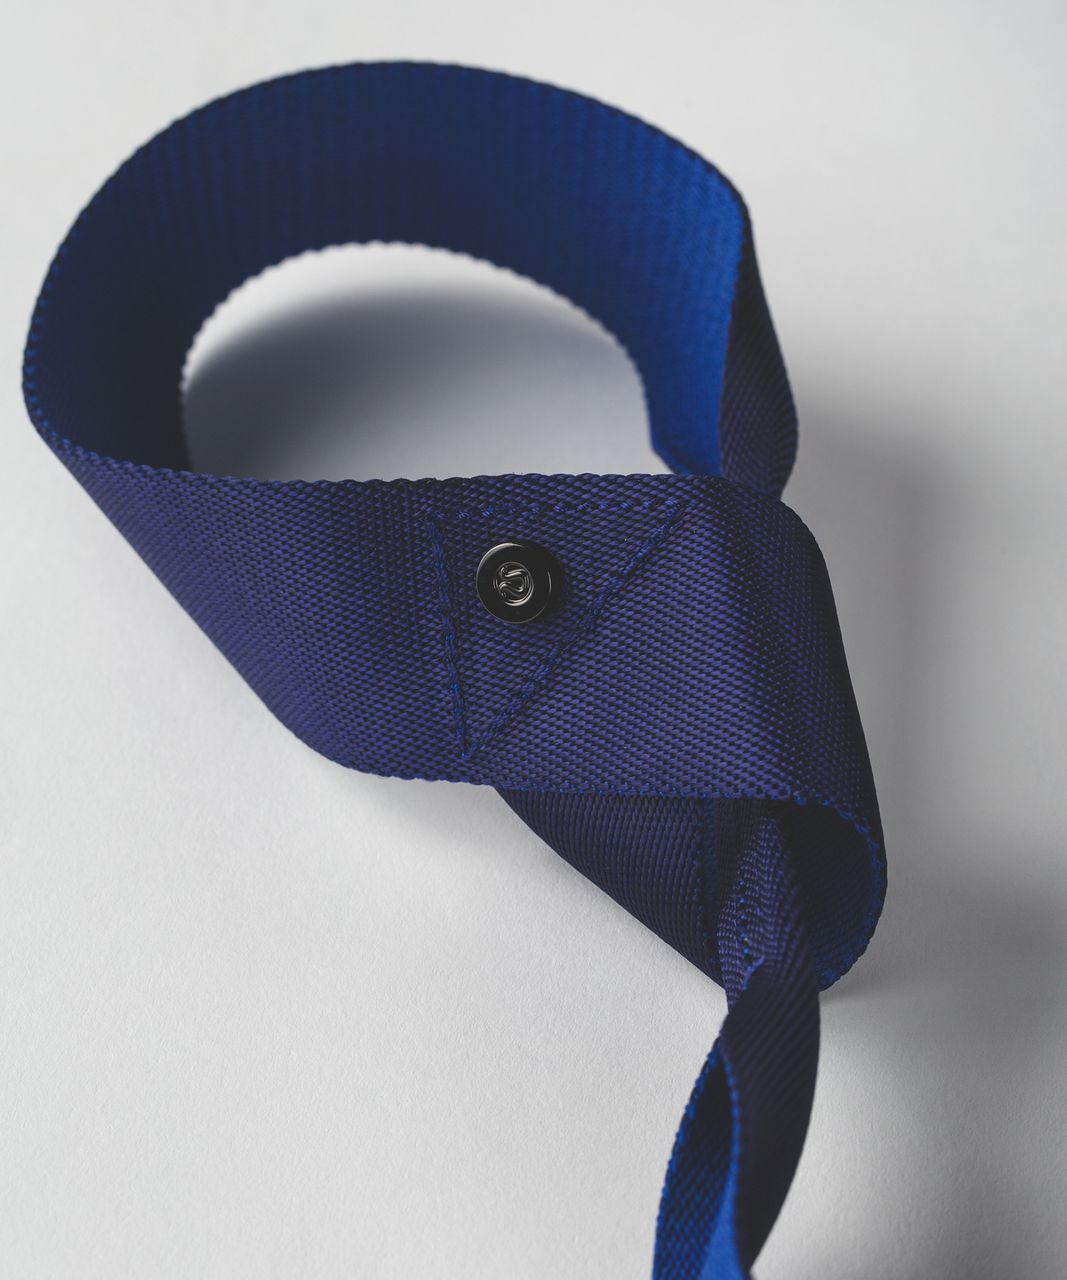 Lululemon Loop It Up Mat Strap - Emperor Blue / Sapphire Blue